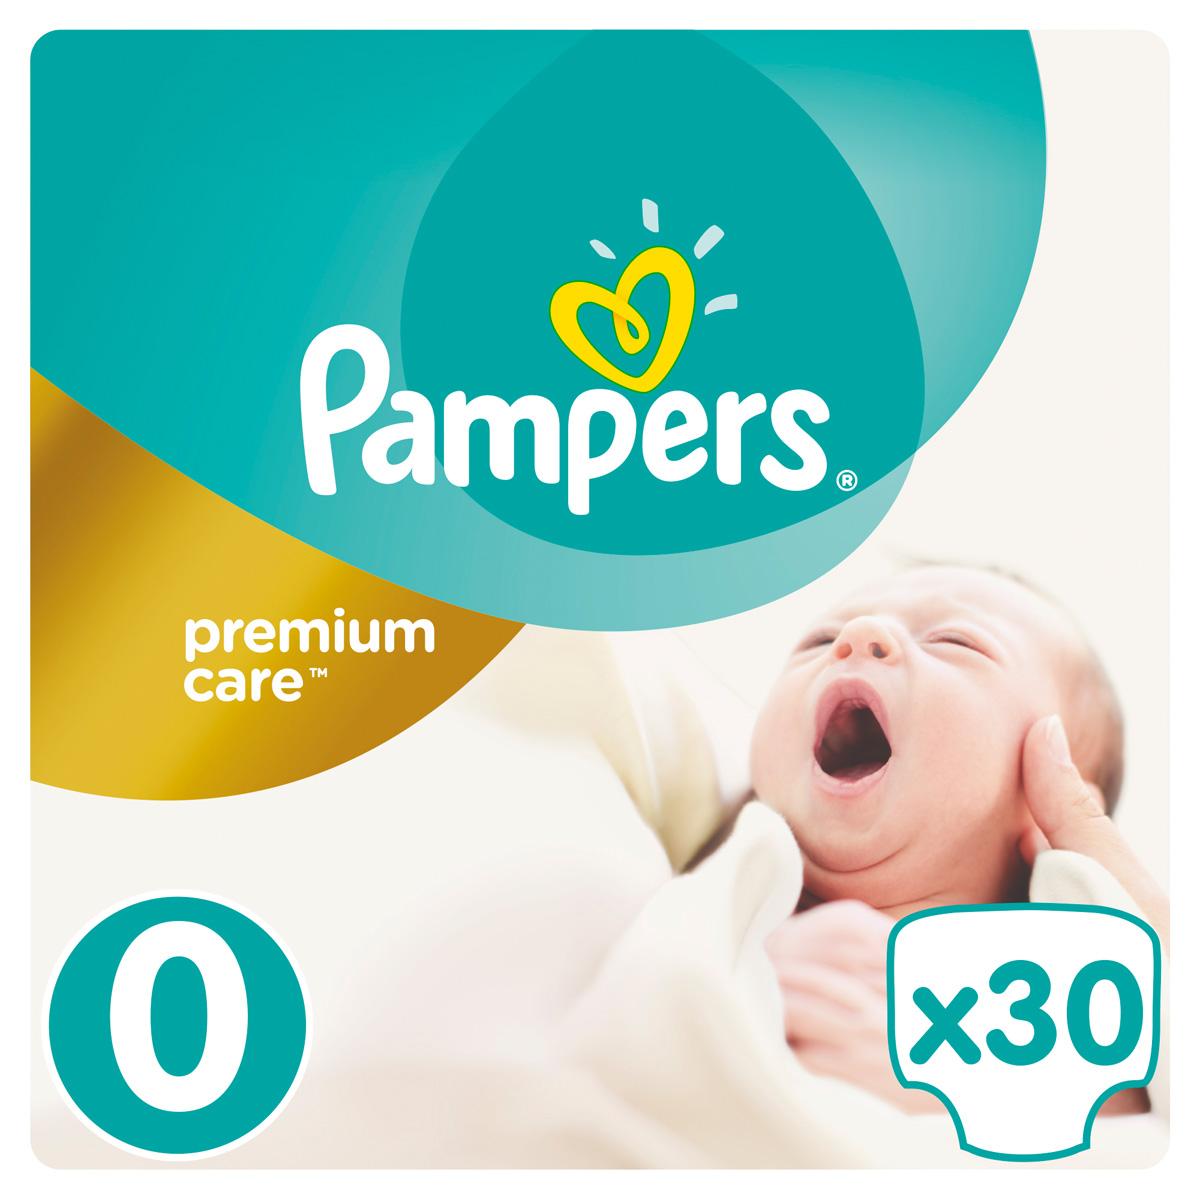 Pampers Подгузники Premium Care 0-2,5 кг (размер 0) 30 шт подгузники детские pampers подгузники pampers premium care 2 5 кг 1 размер 88 шт